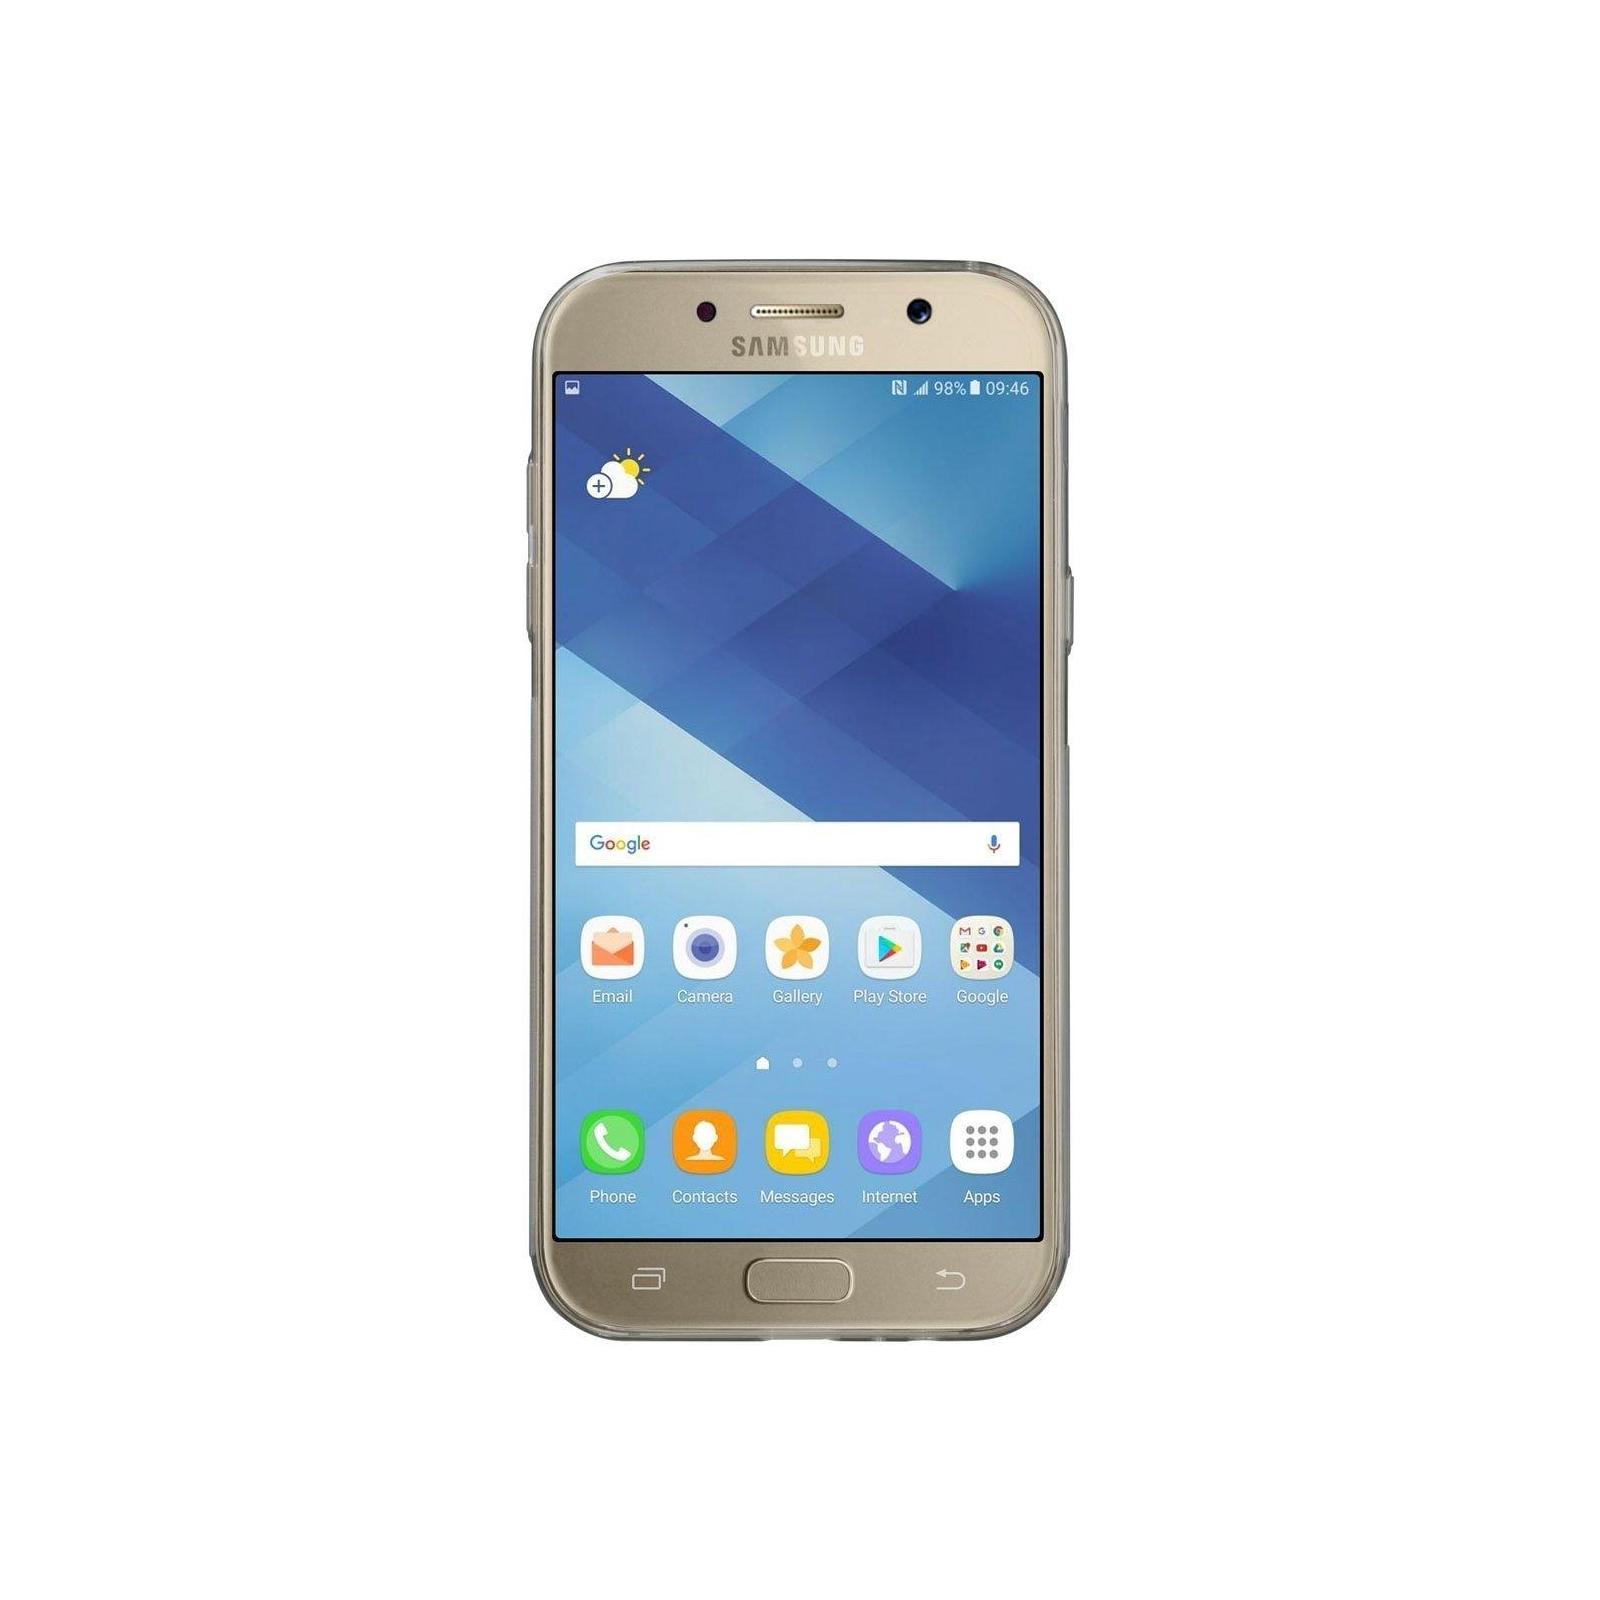 Чехол для моб. телефона SmartCase Samsung Galaxy A7 /A720 TPU Clear (SC-A7) изображение 4